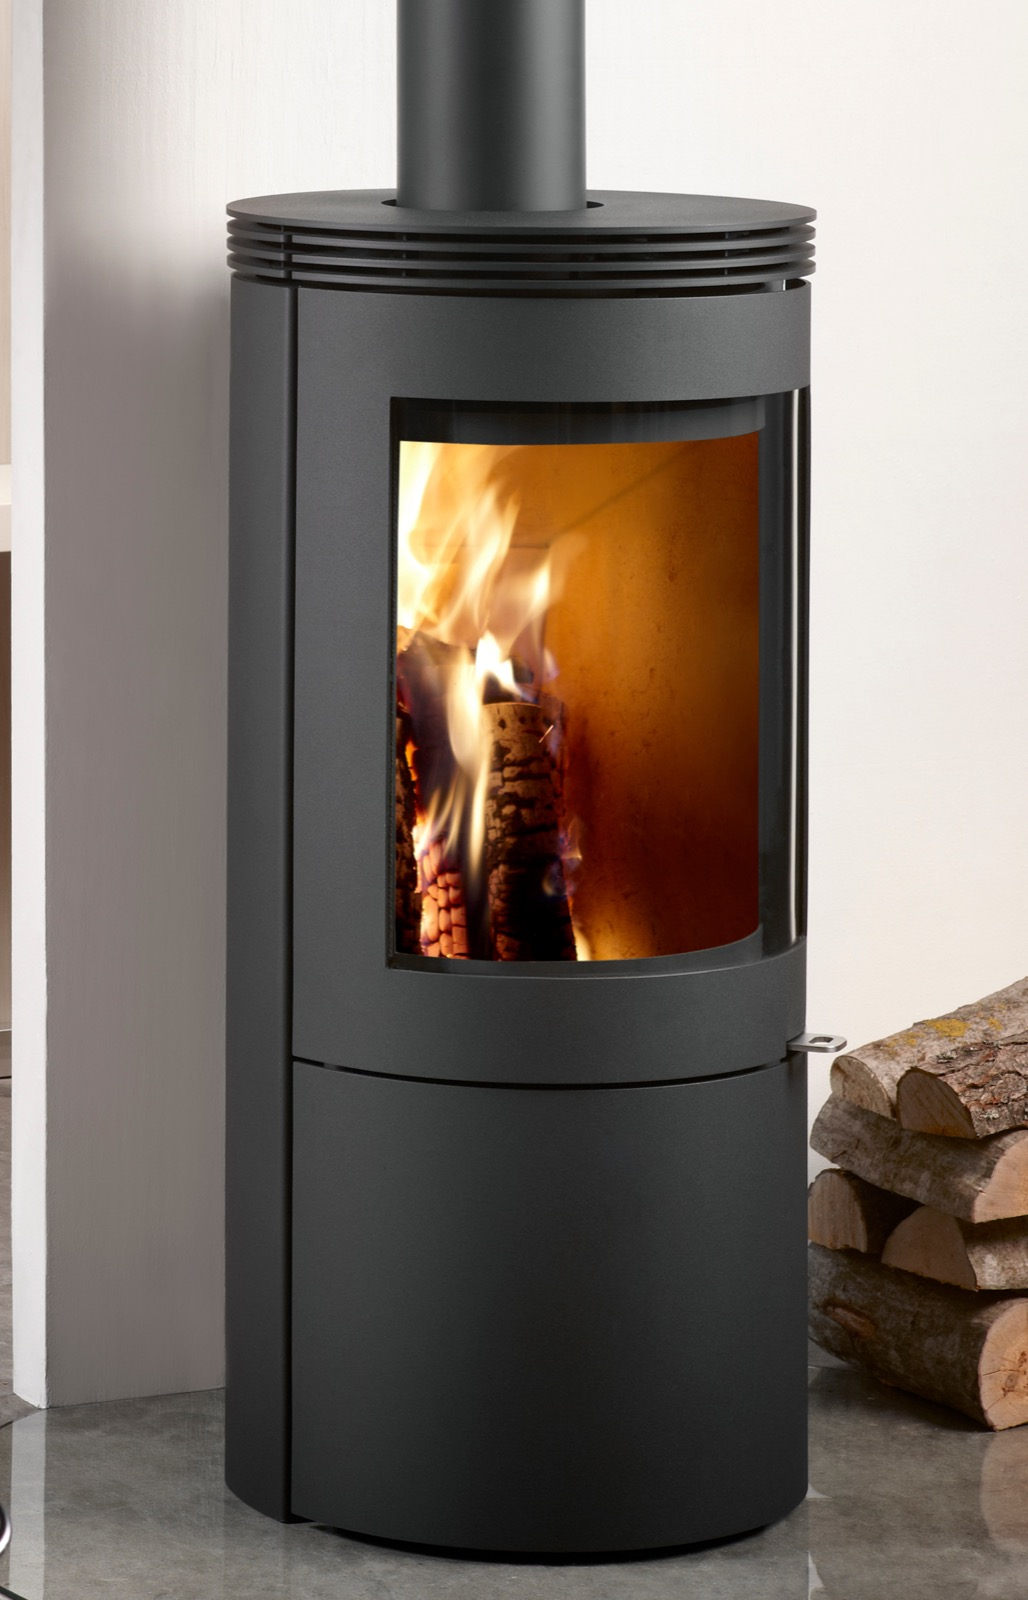 Westfire Uniq 27 Se Convection Wood Burning Stove In Black